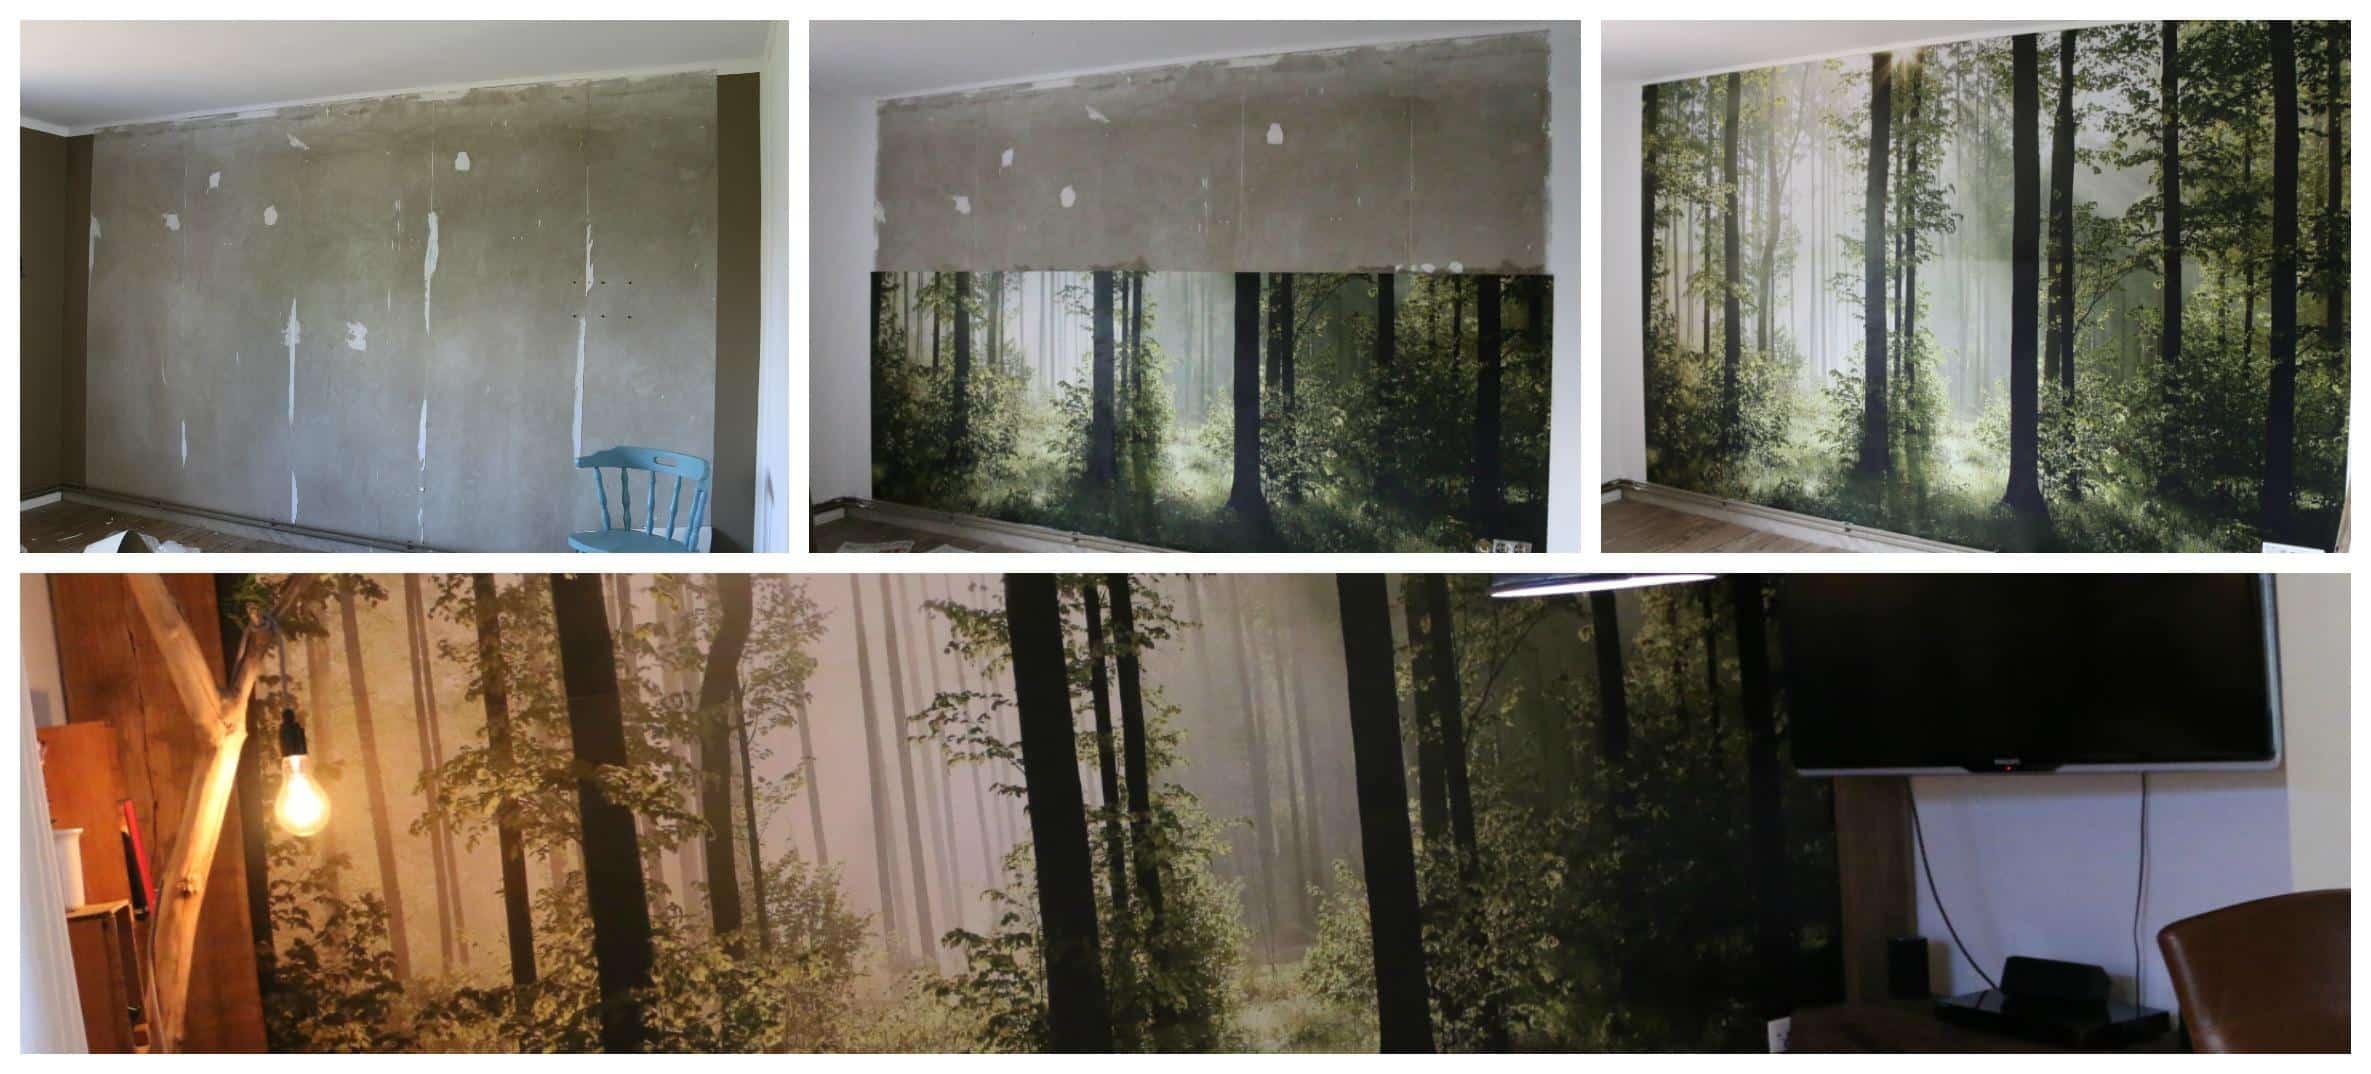 Room makeover-vorher-nachher